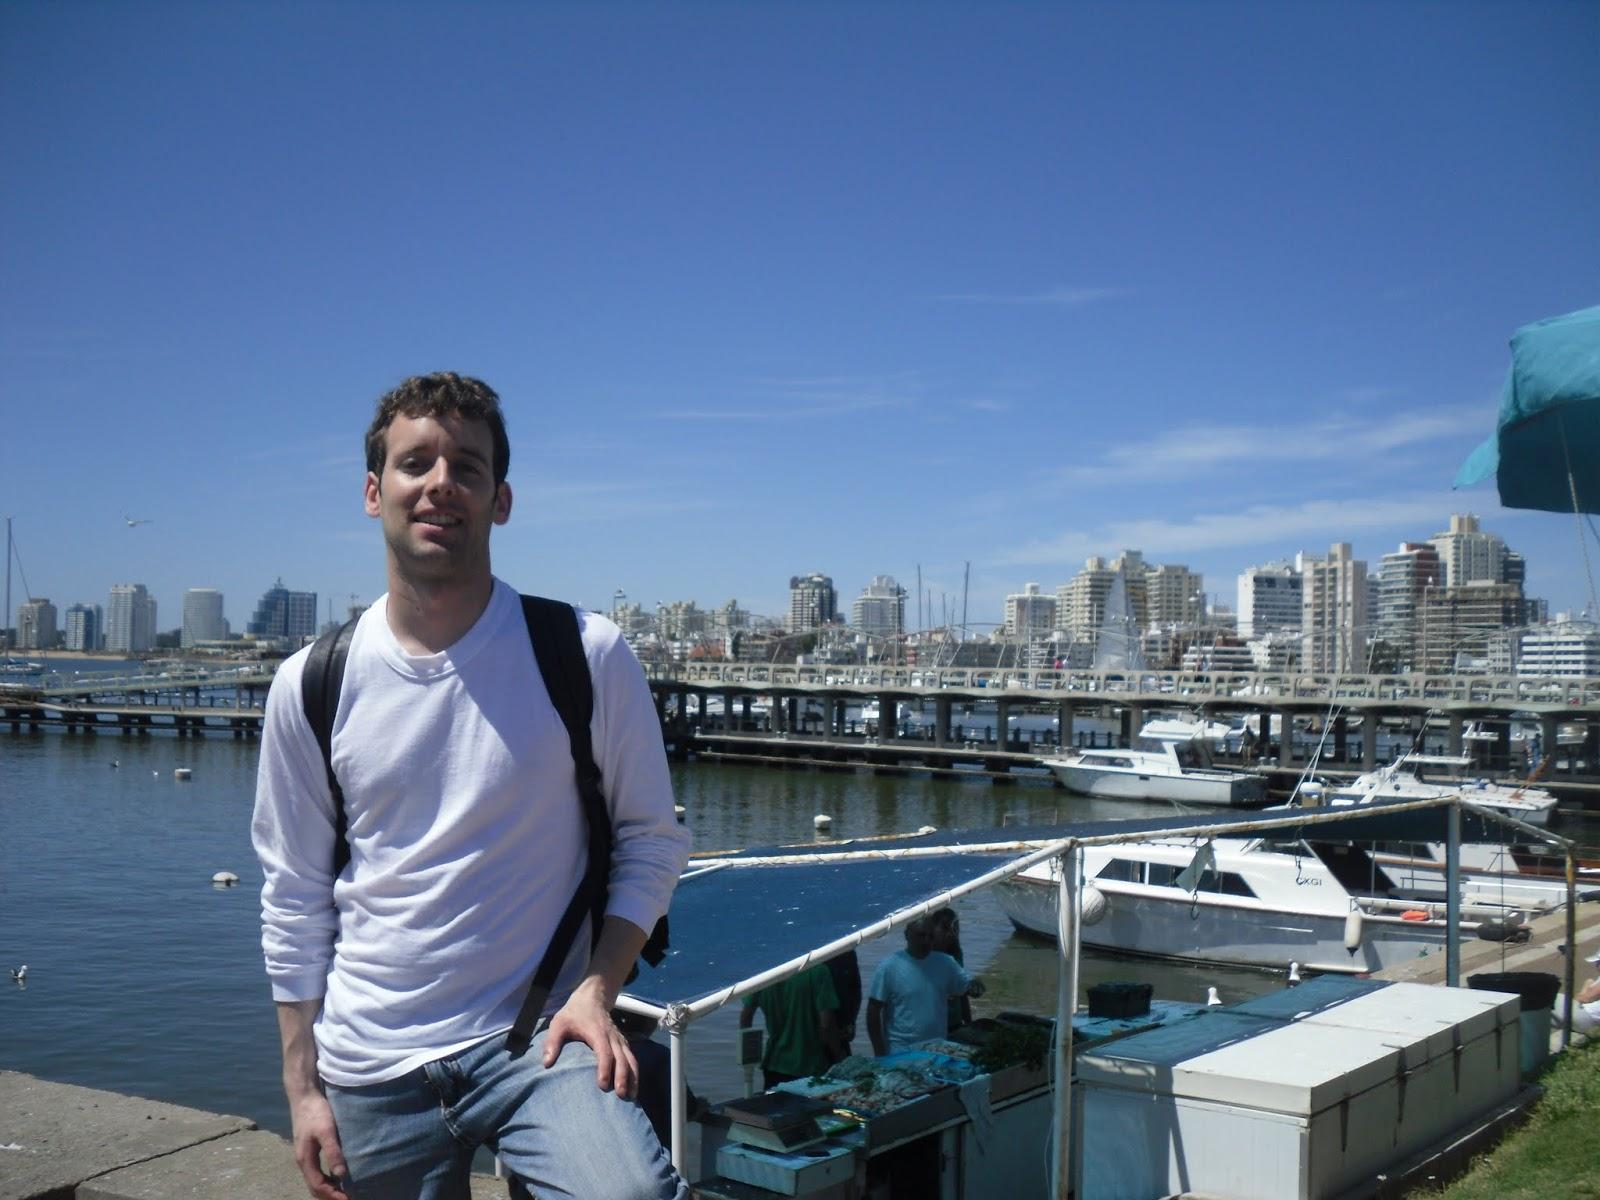 Andrés de Bitácoras de Viaje